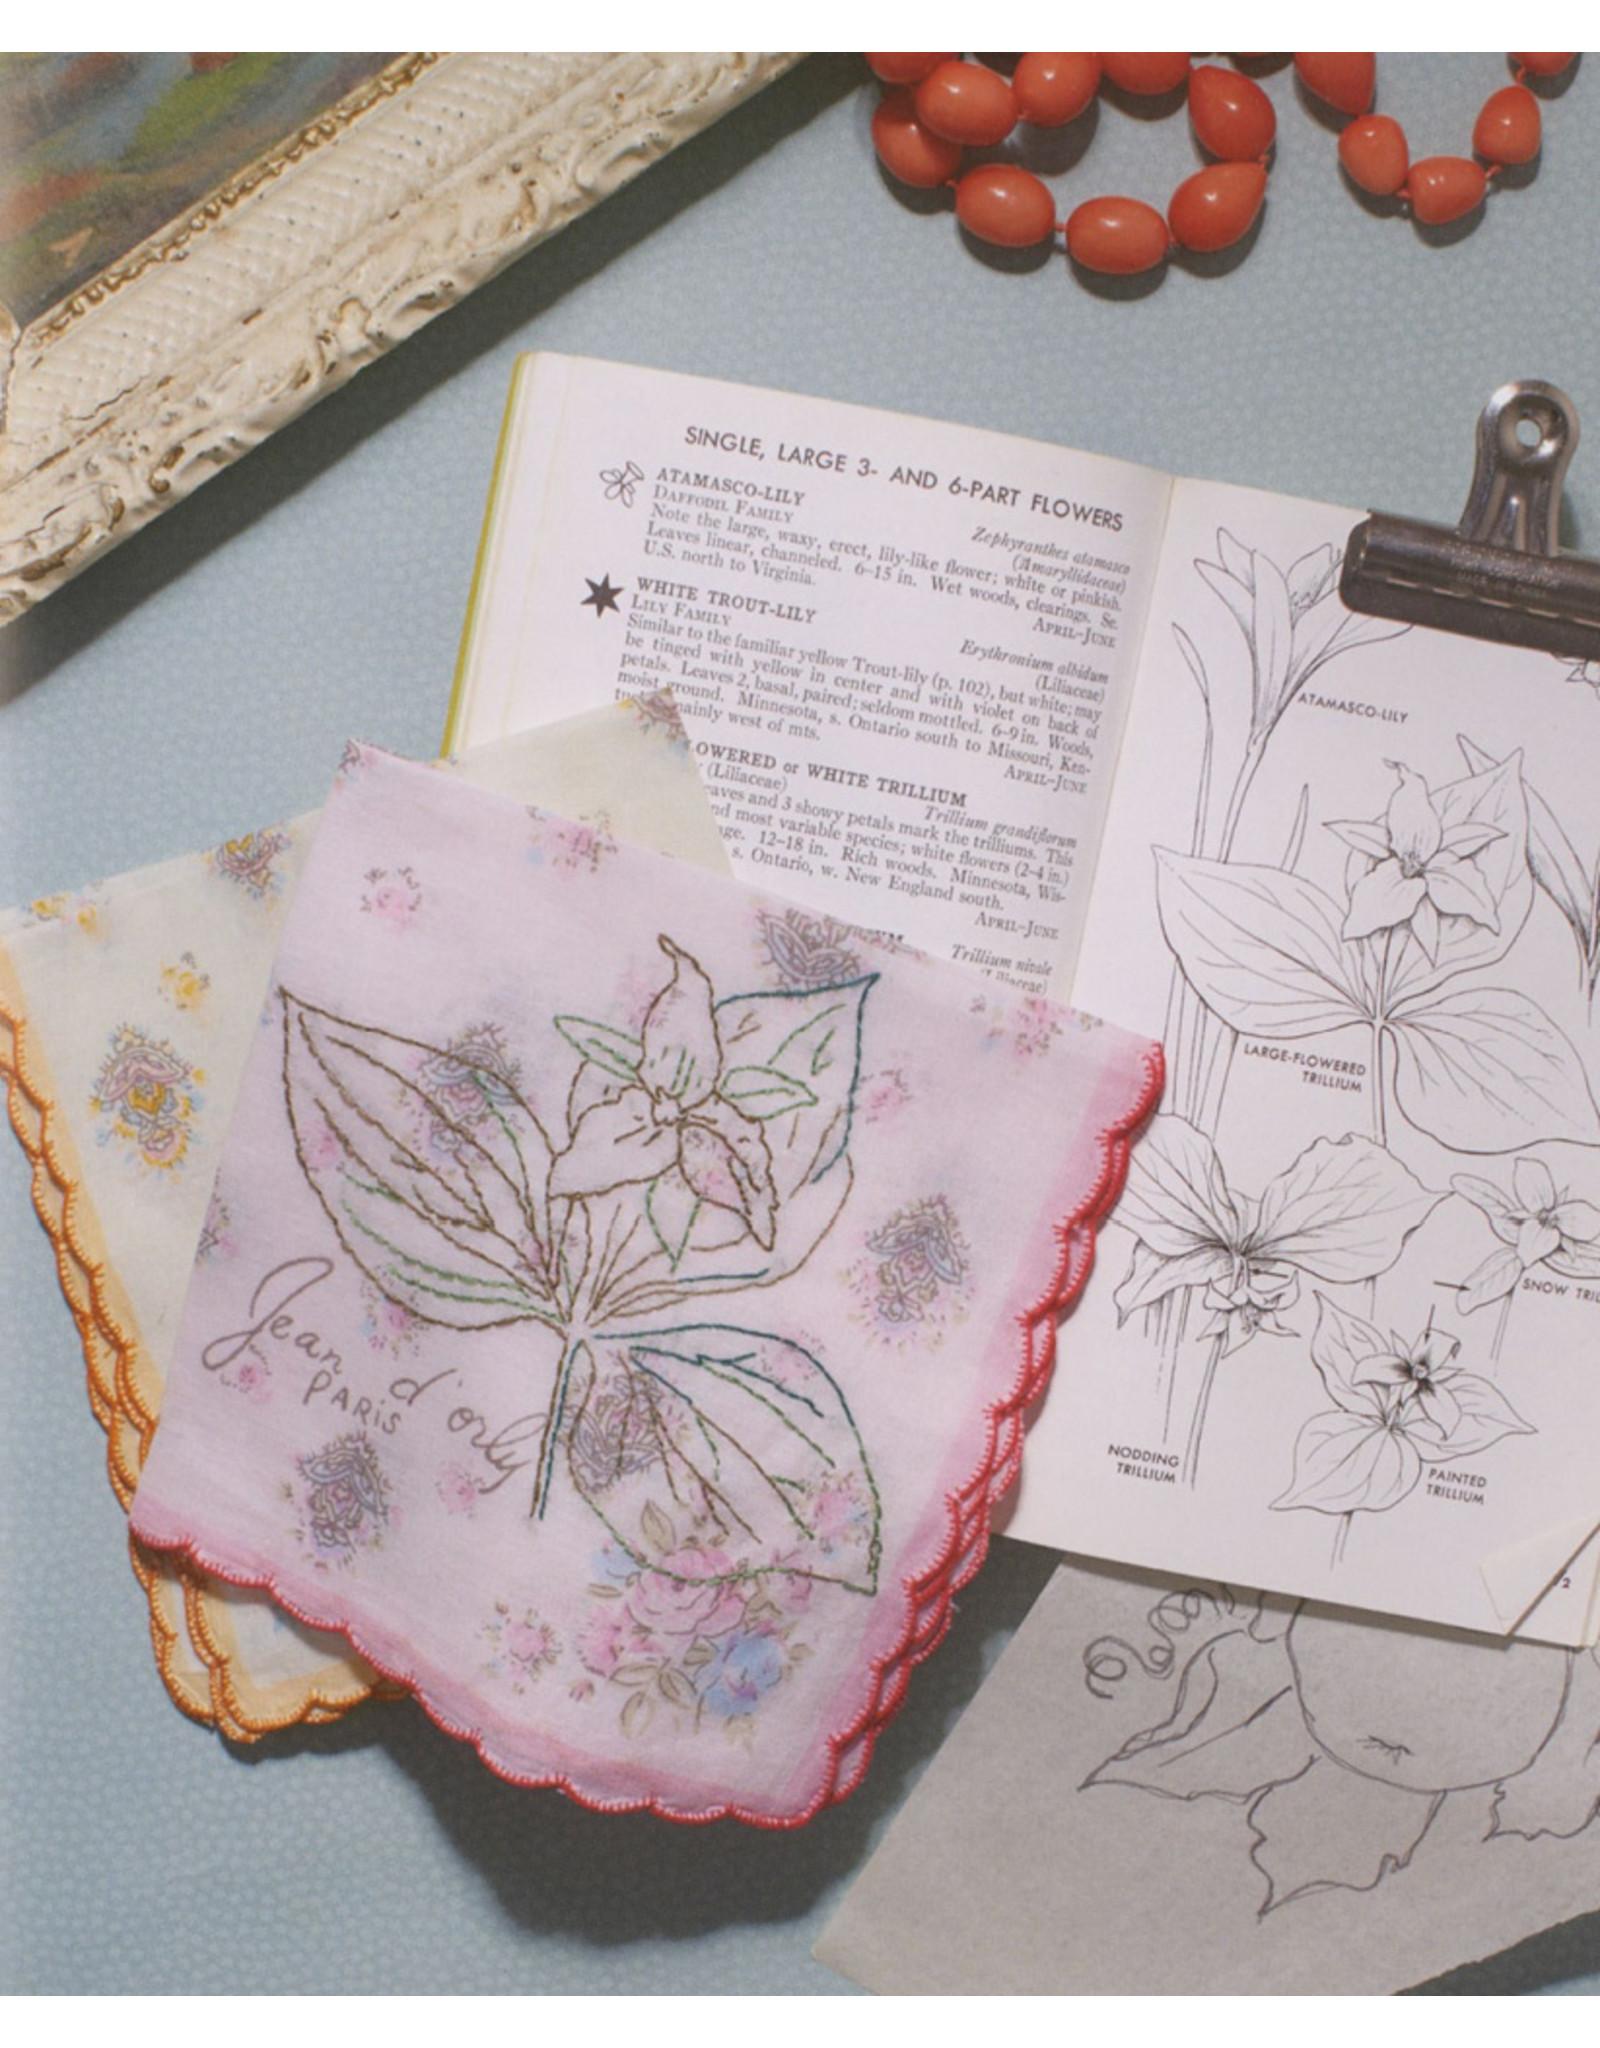 Dropcloth Samplers Rebecca Ringquist's Embroidery Workshops